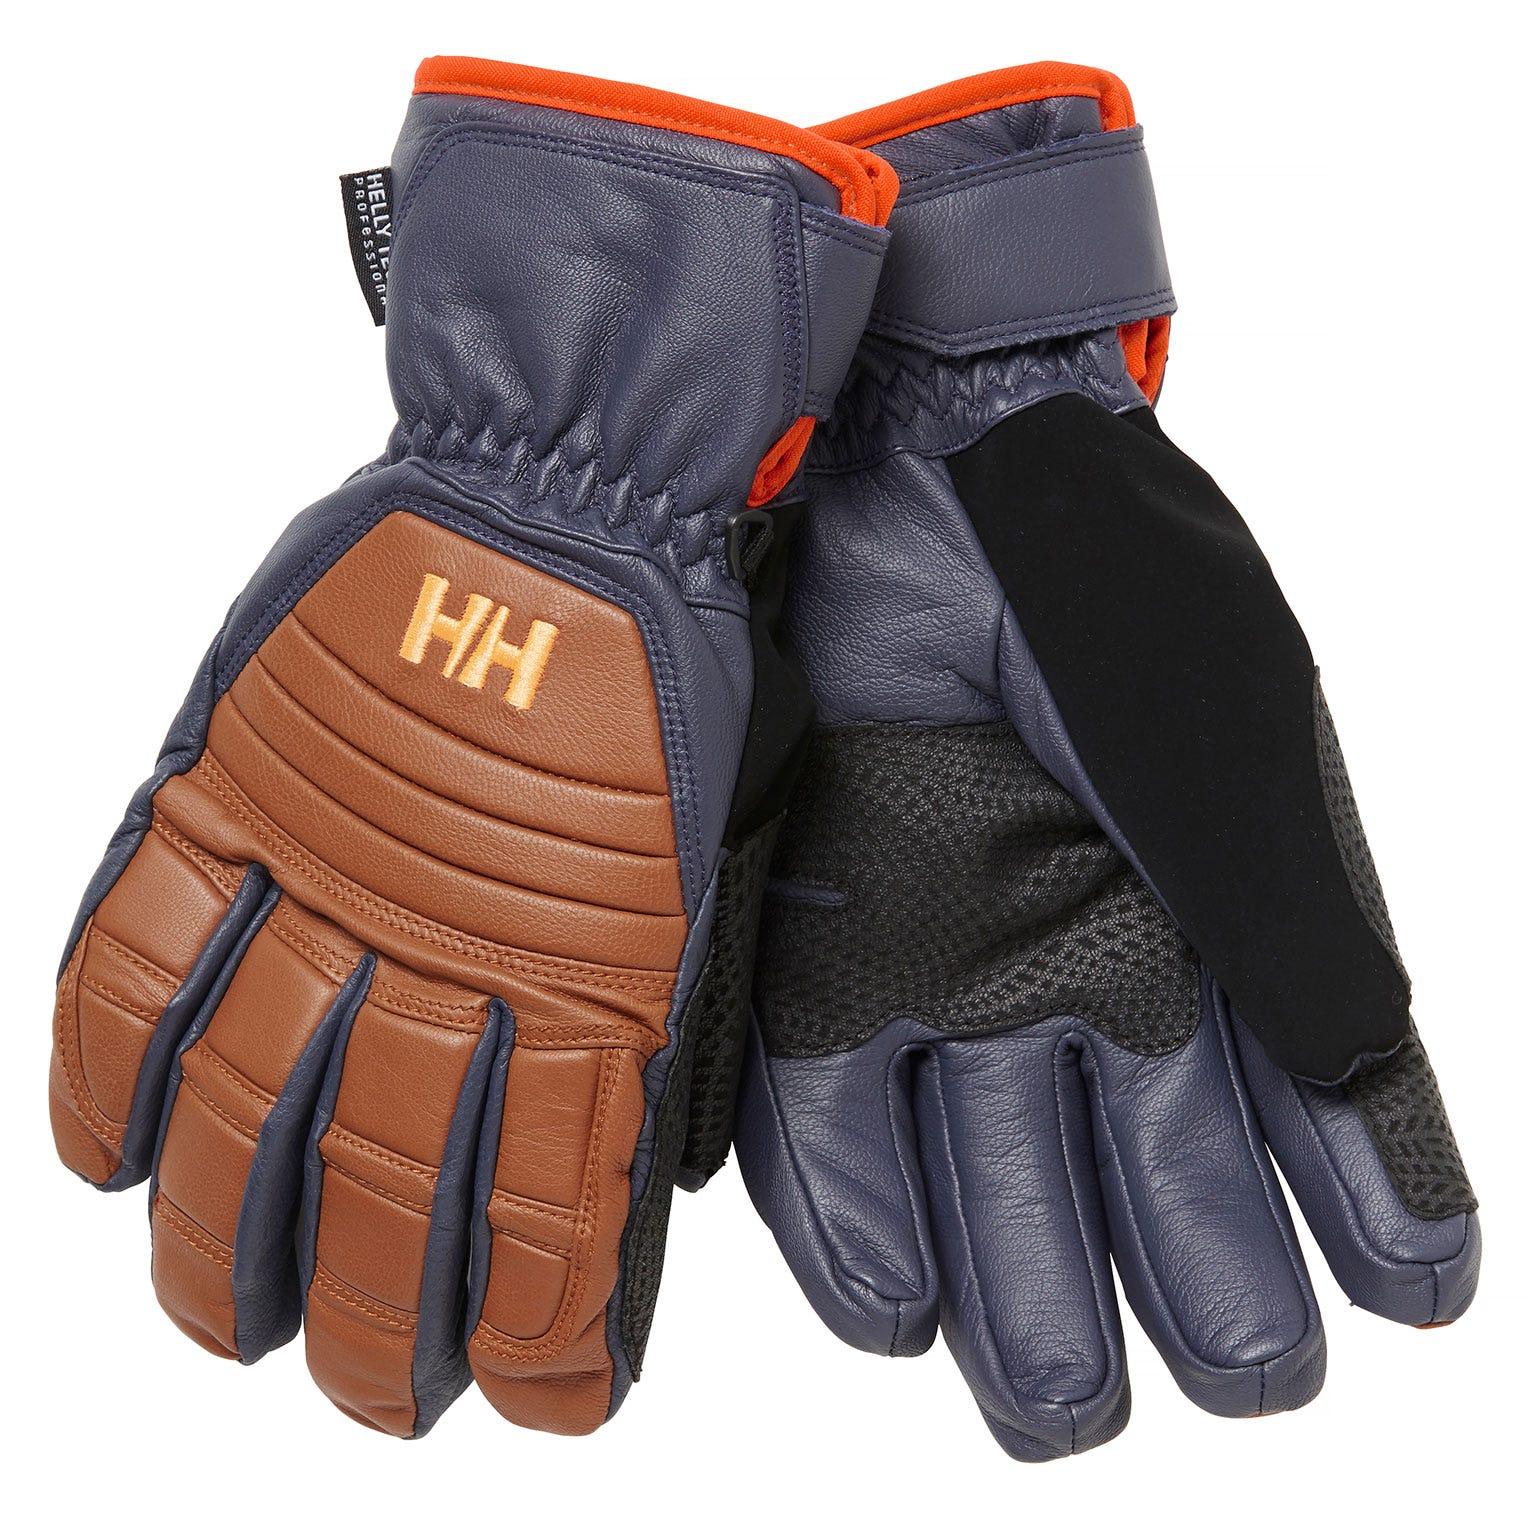 Helly Hansen Ullr Leather Ht Glove Mens Brown S